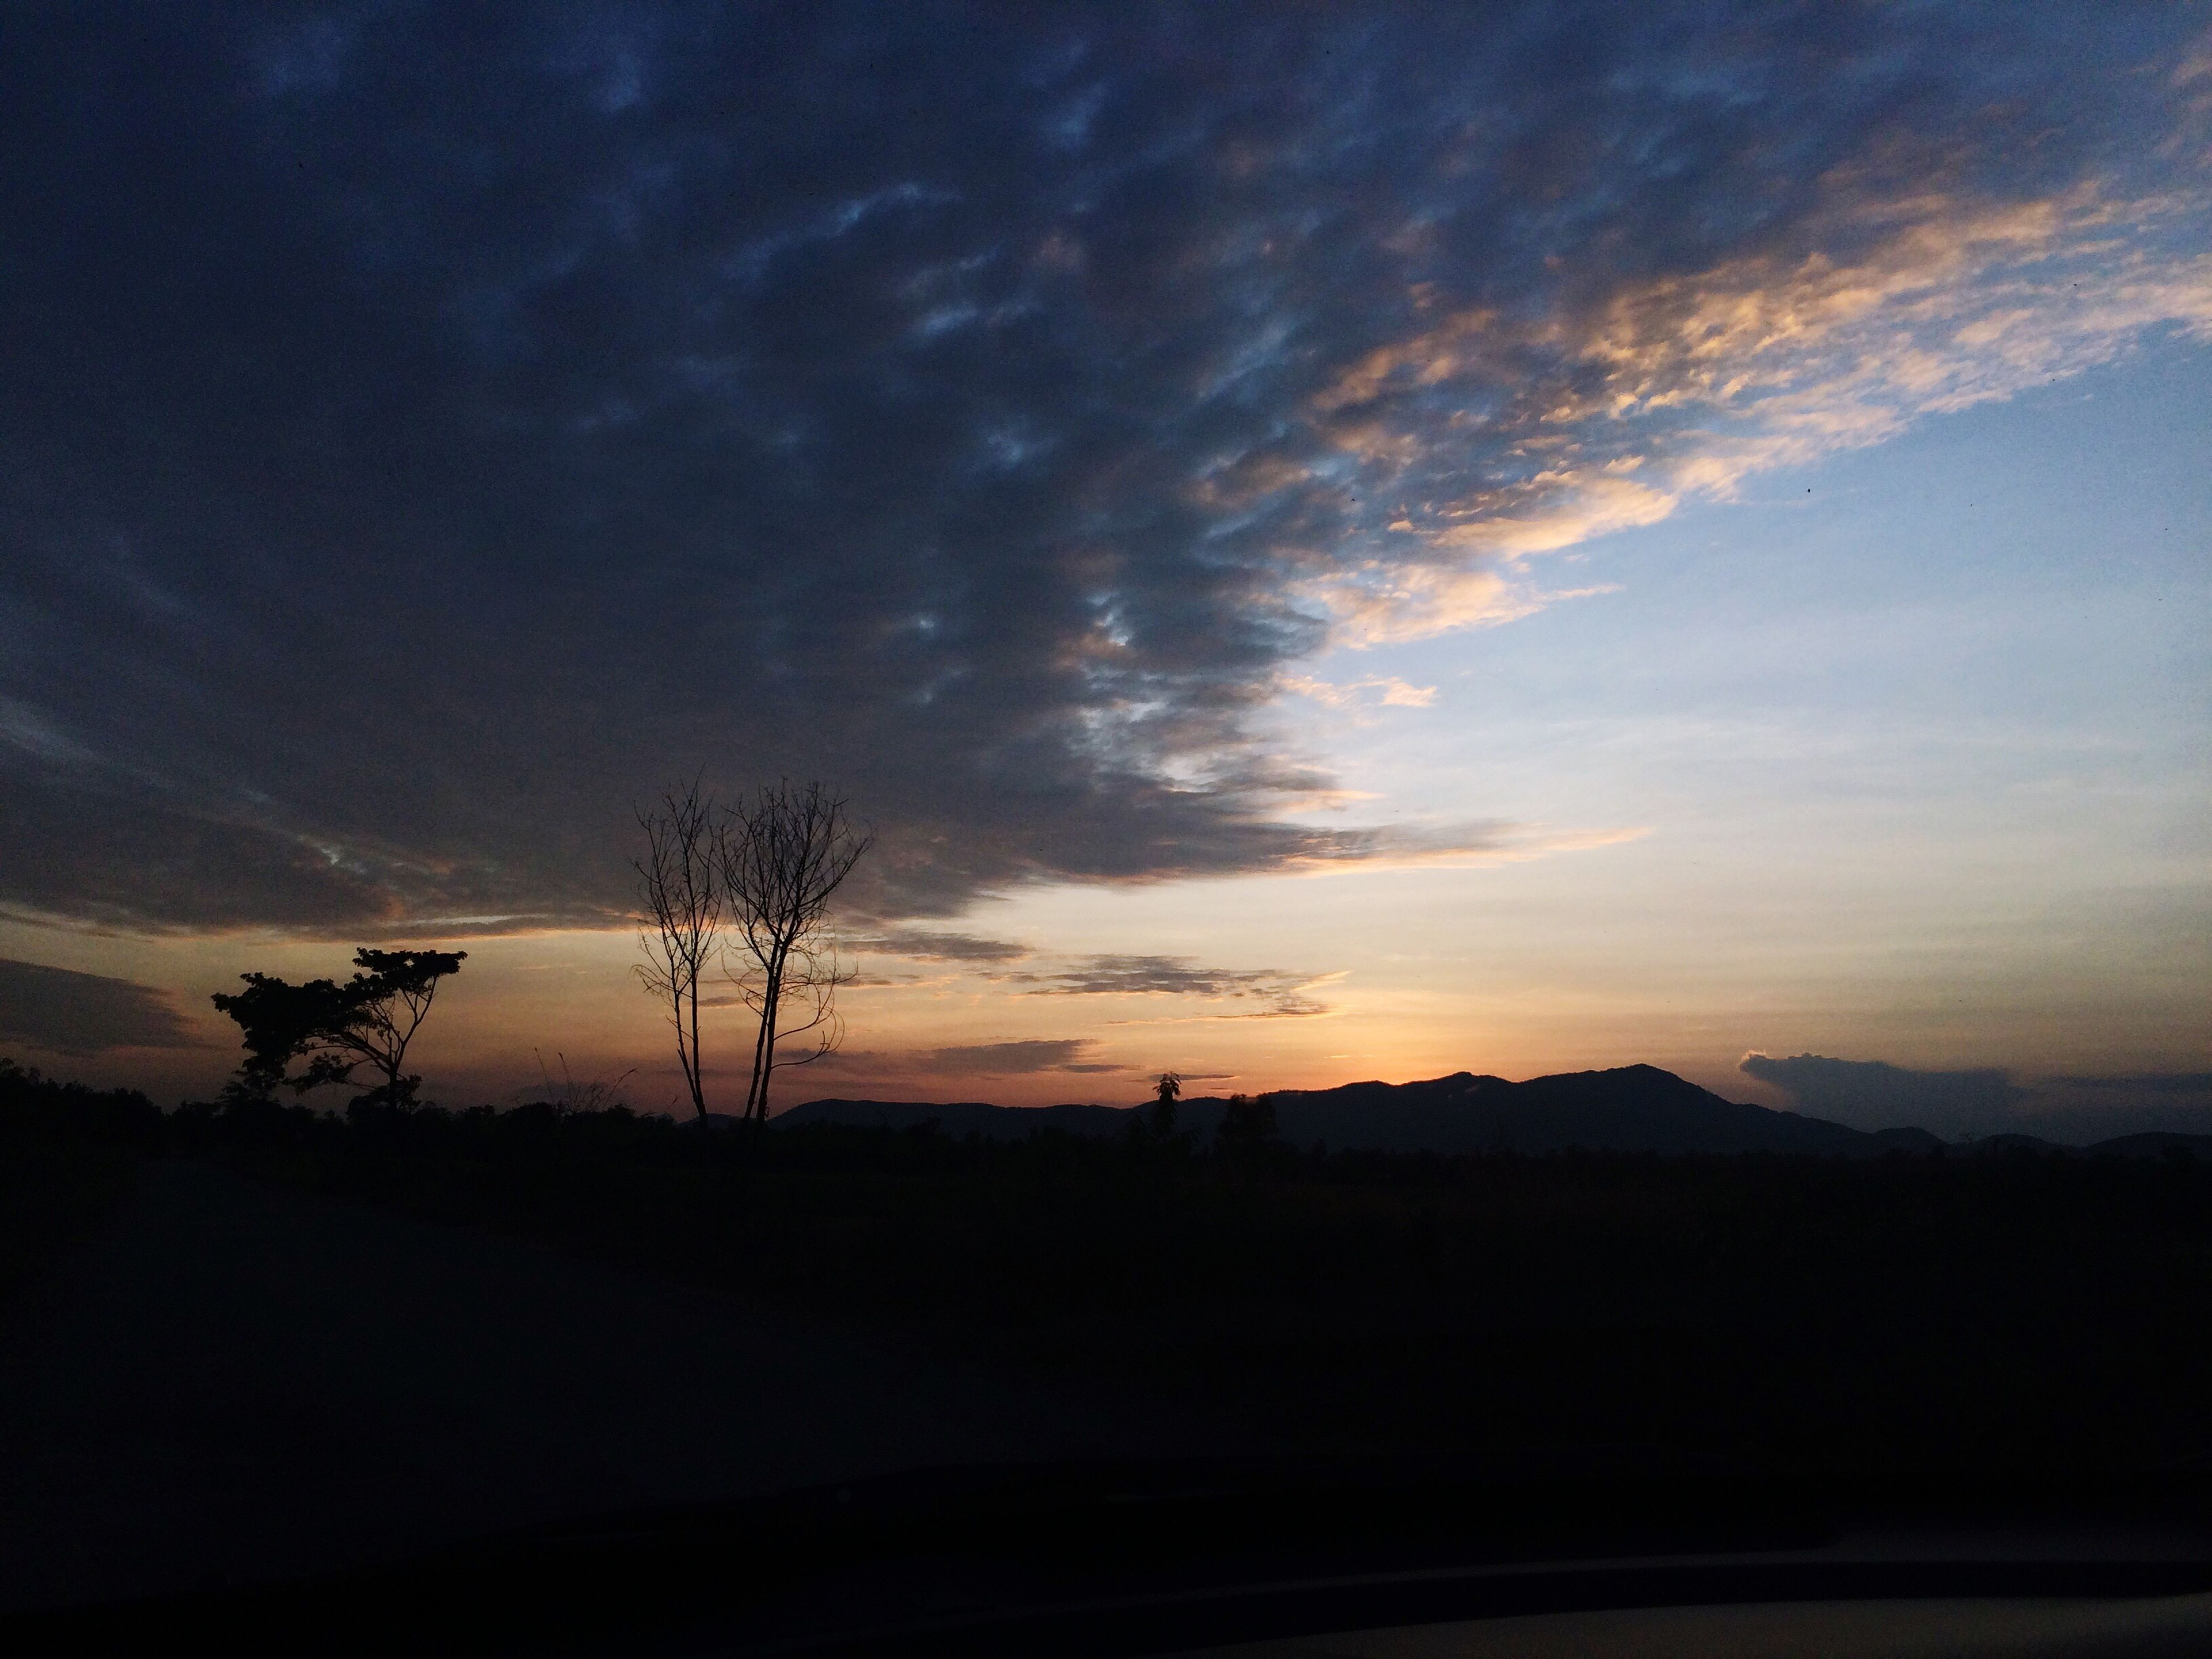 silhouette, sunset, tranquil scene, sky, scenics, tranquility, beauty in nature, landscape, cloud - sky, nature, mountain, idyllic, cloud, non-urban scene, dark, orange color, dramatic sky, dusk, tree, mountain range